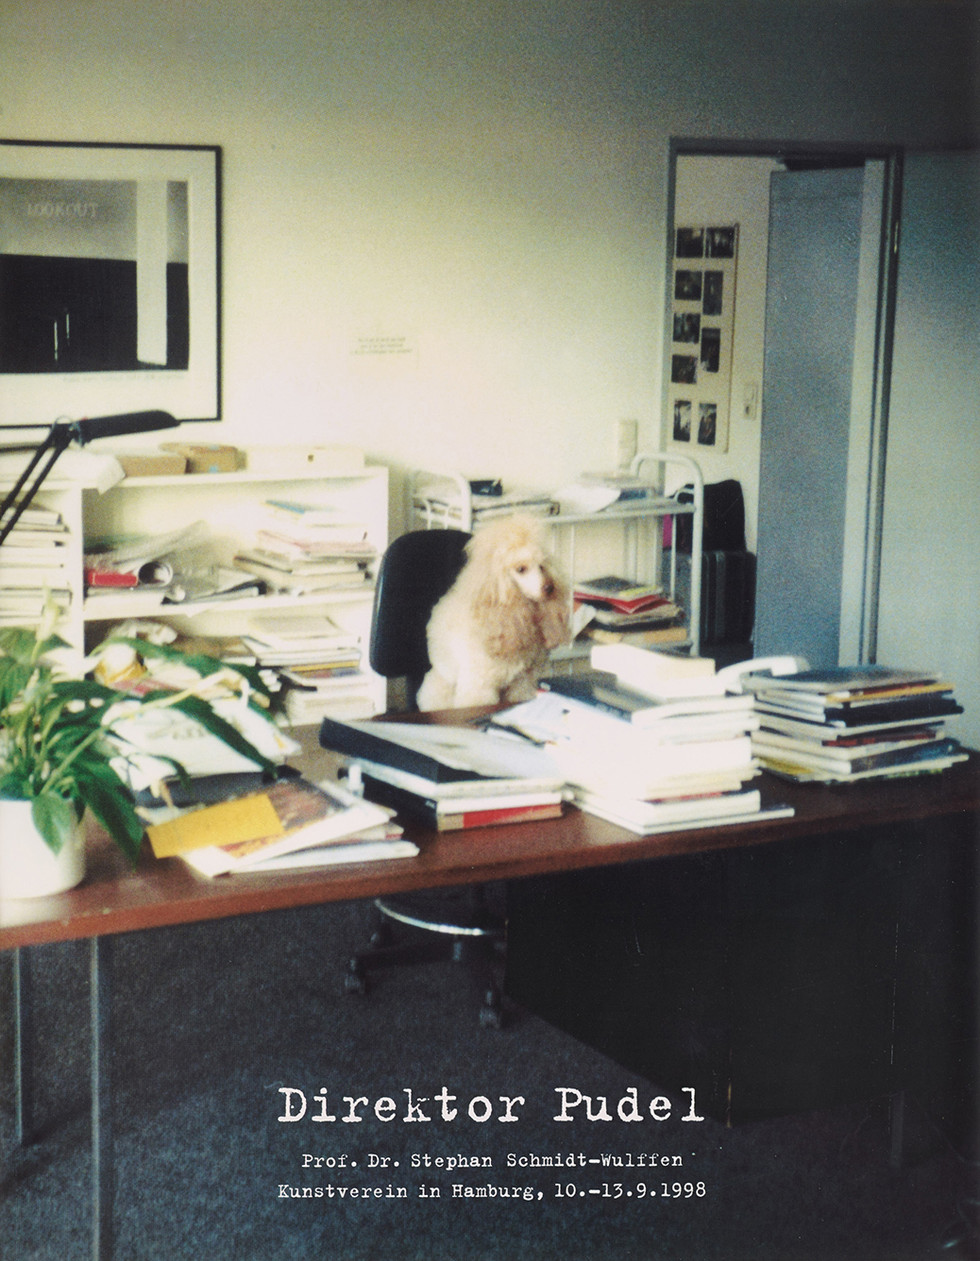 Direktor Pudel (Director Poodle), 1998 © Christian Jankowski. Courtesy Lisson Gallery